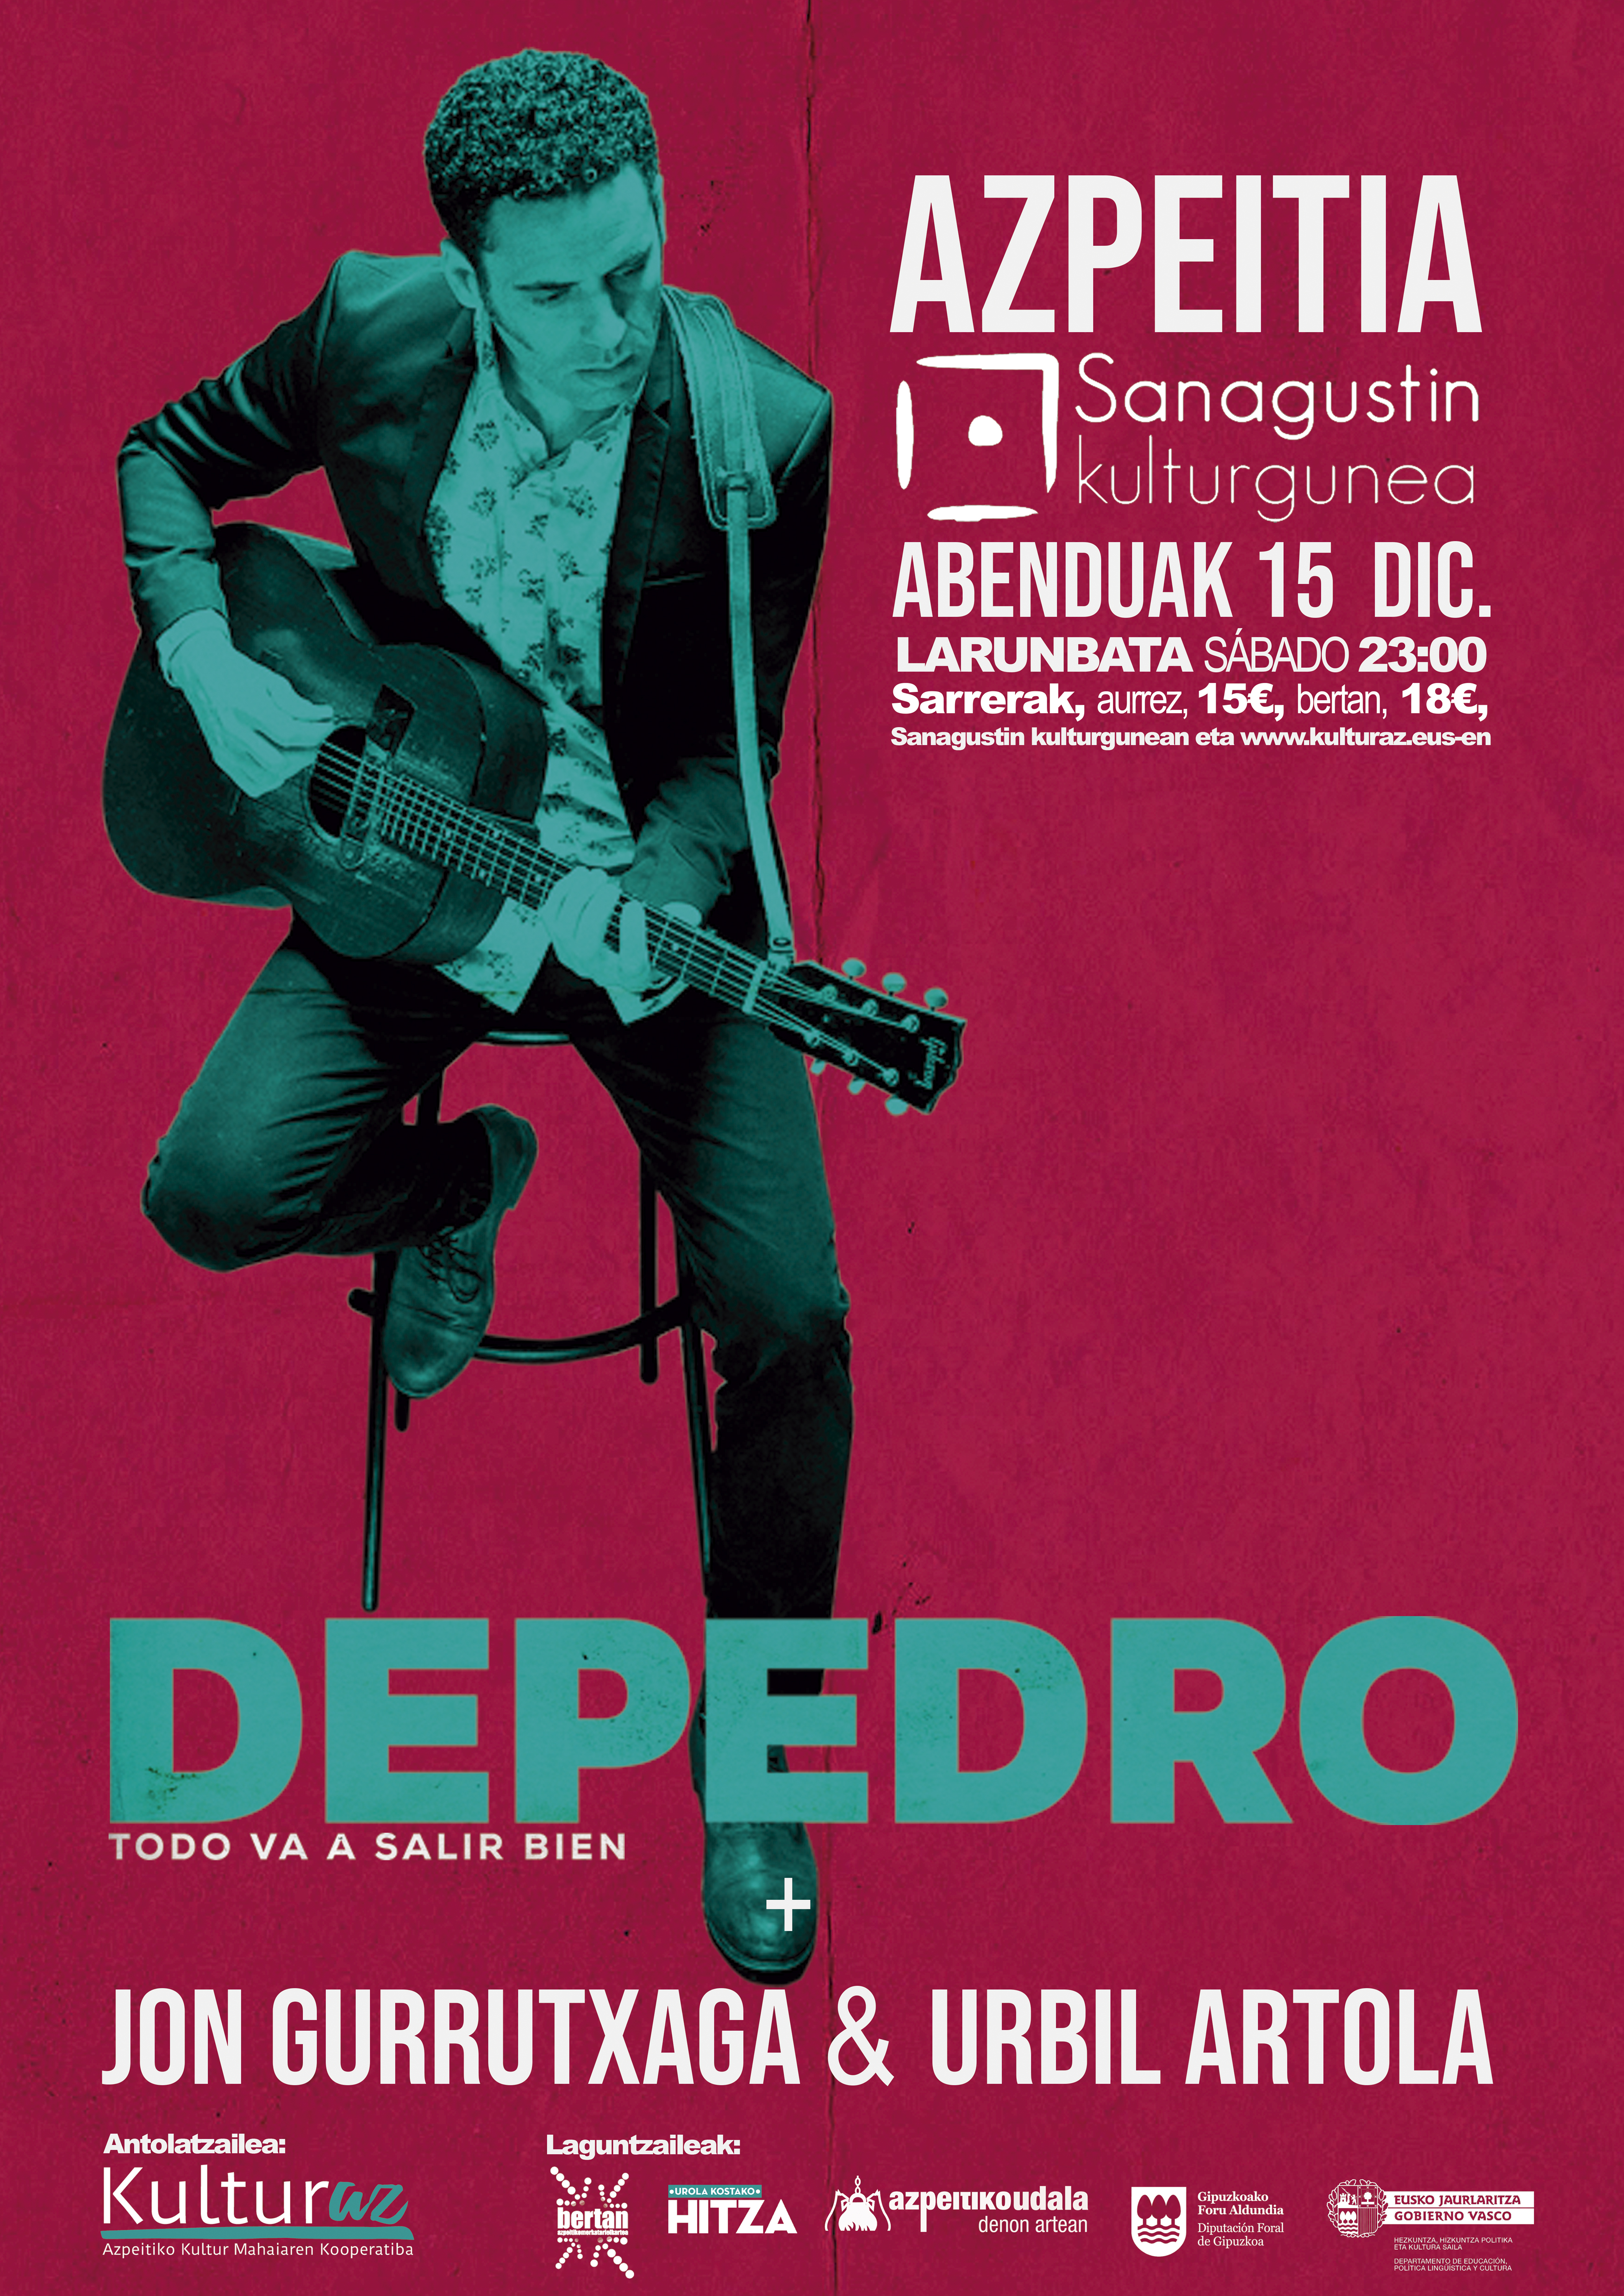 Depedro + Jon Gurrutxaga & Urbil Artola